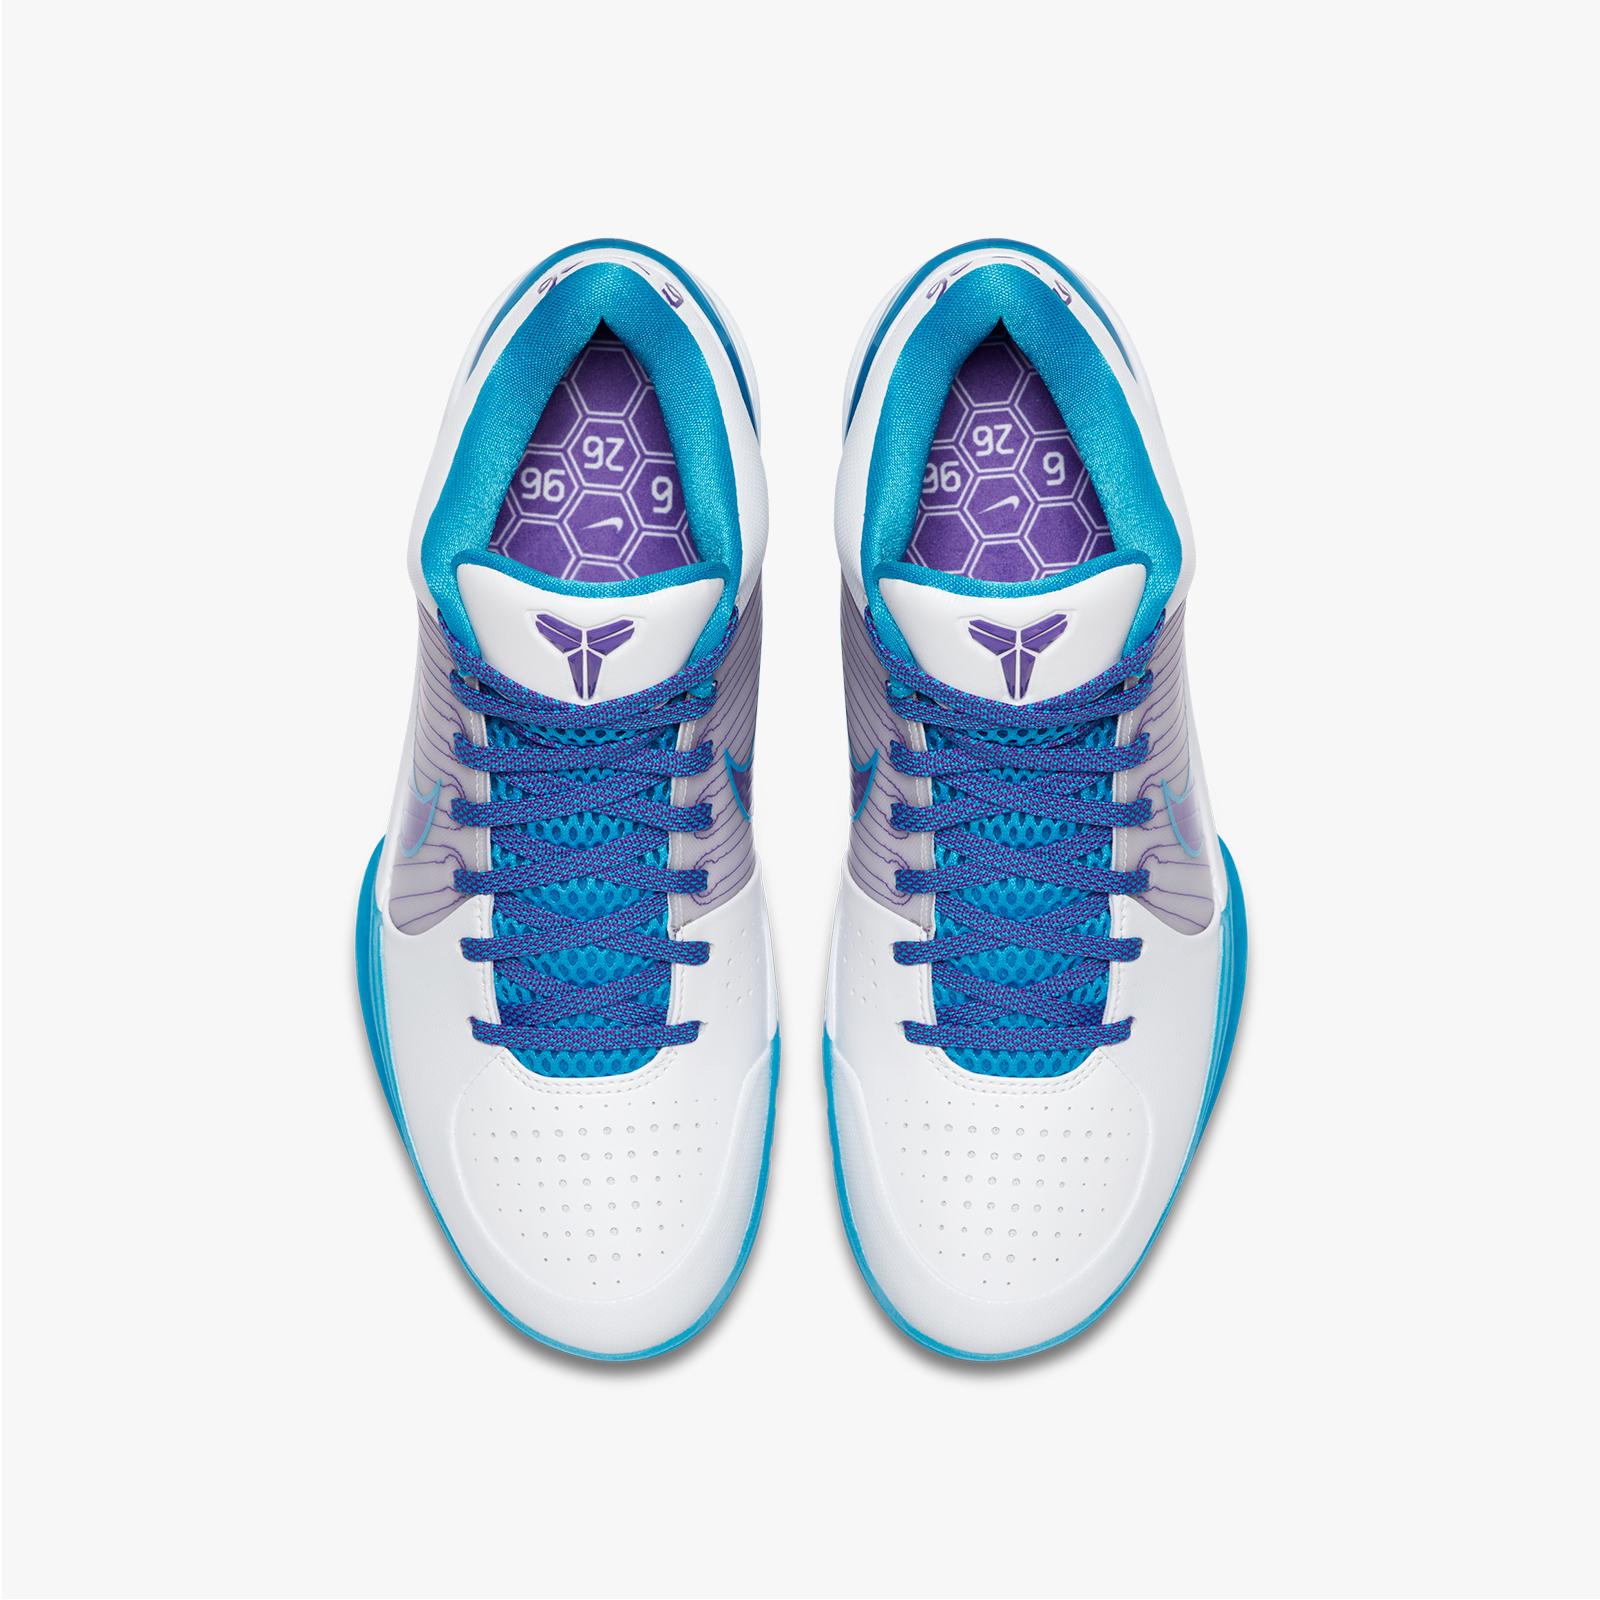 824d66640200c Nike Kobe IV Protro - Av6339-100 - Sneakersnstuff | sneakers ...